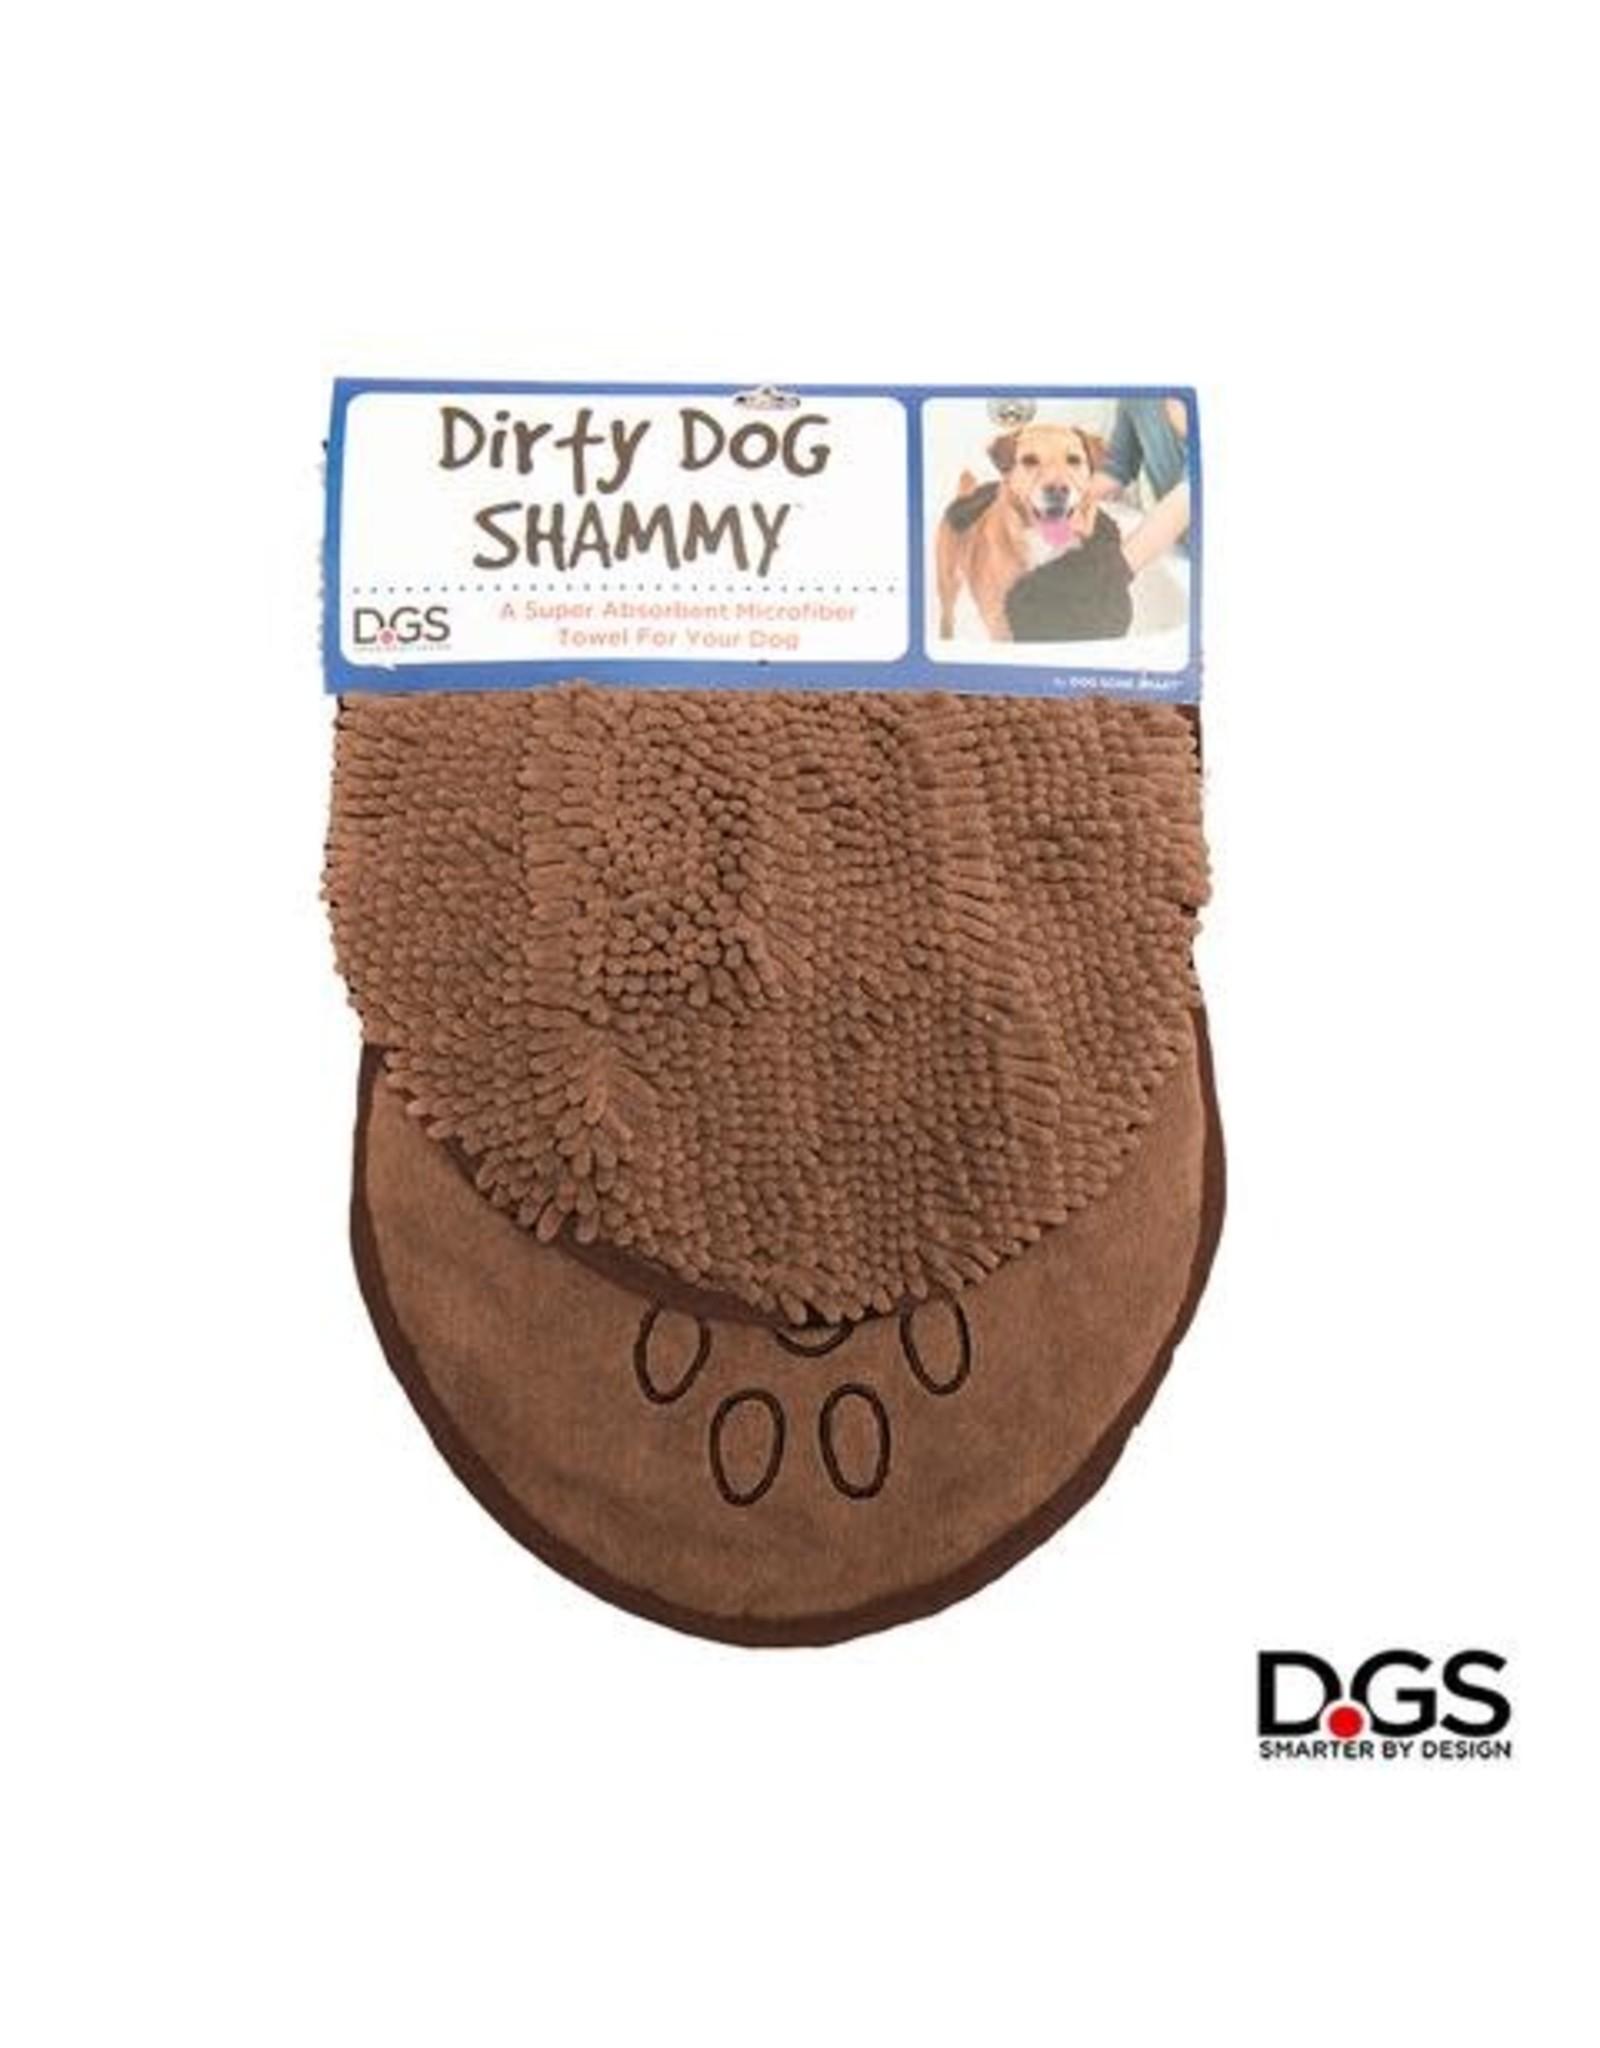 DogGoneSmart DGS Dirty Dog SHAMMY Towel Brown 13x31